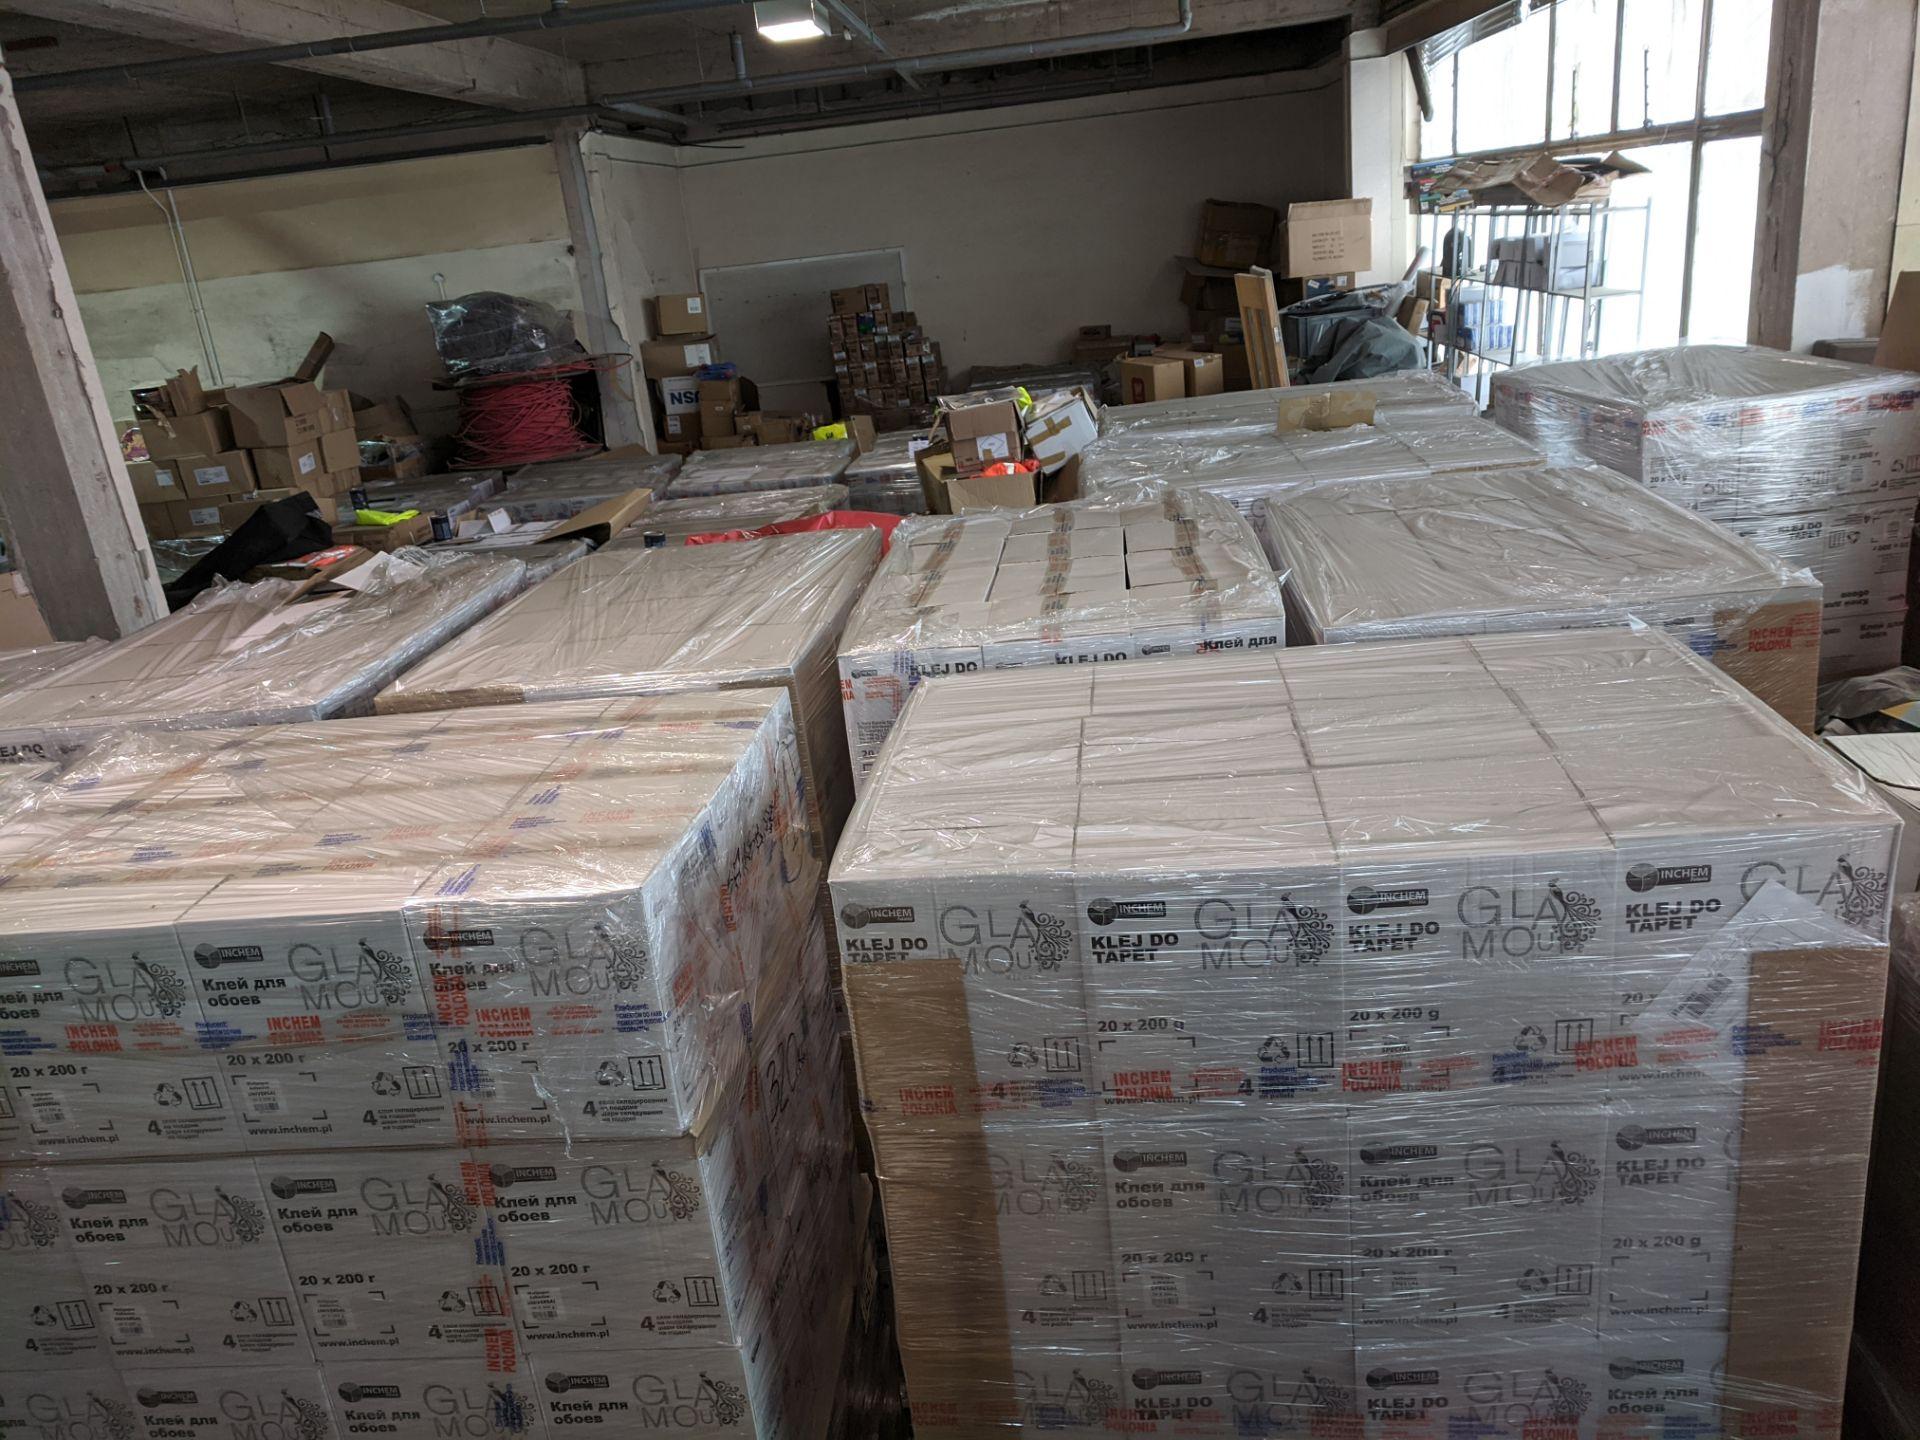 Pallet containing 432 tins Brand new 750ml - Sealed Lazura High Quality Matt Finish Varnish Glaze